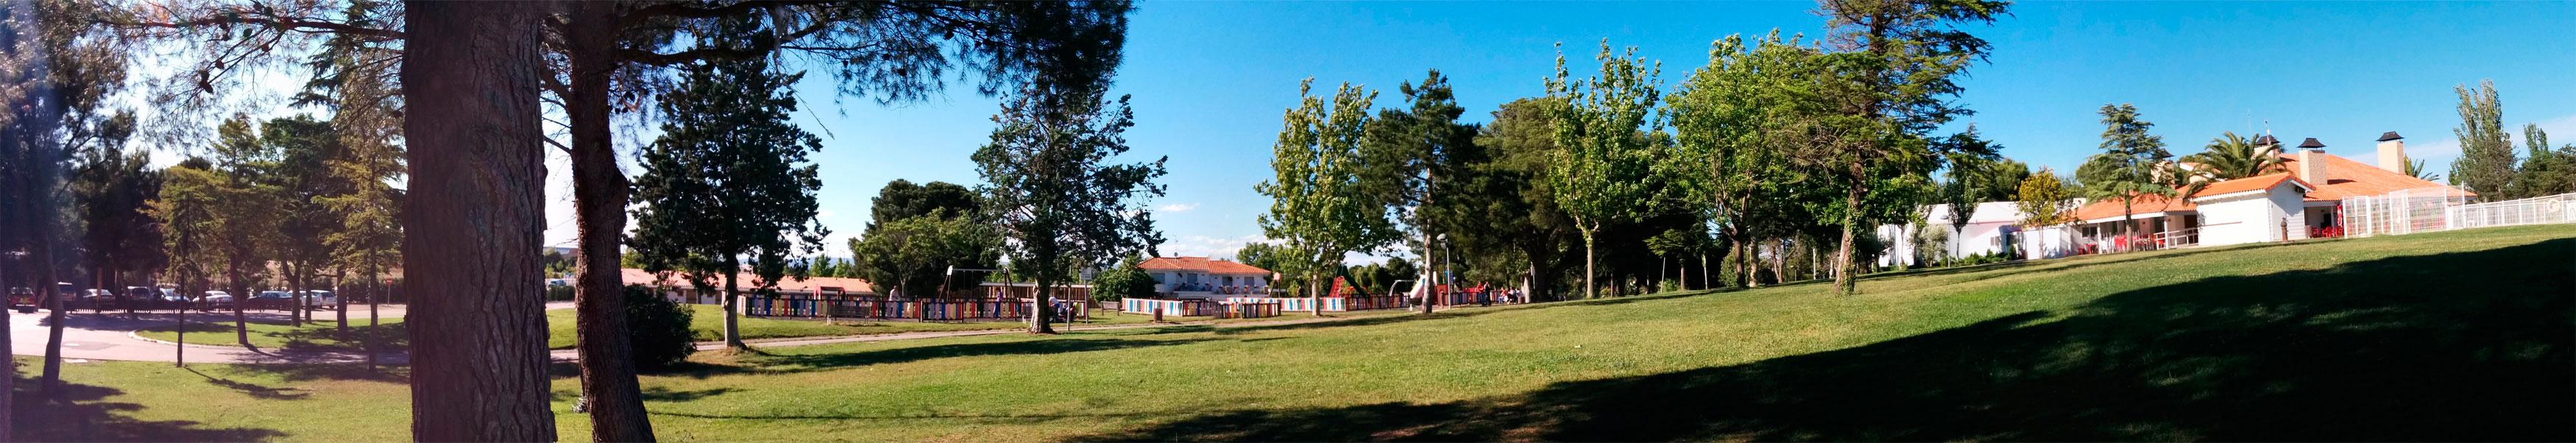 zonas verdes camping